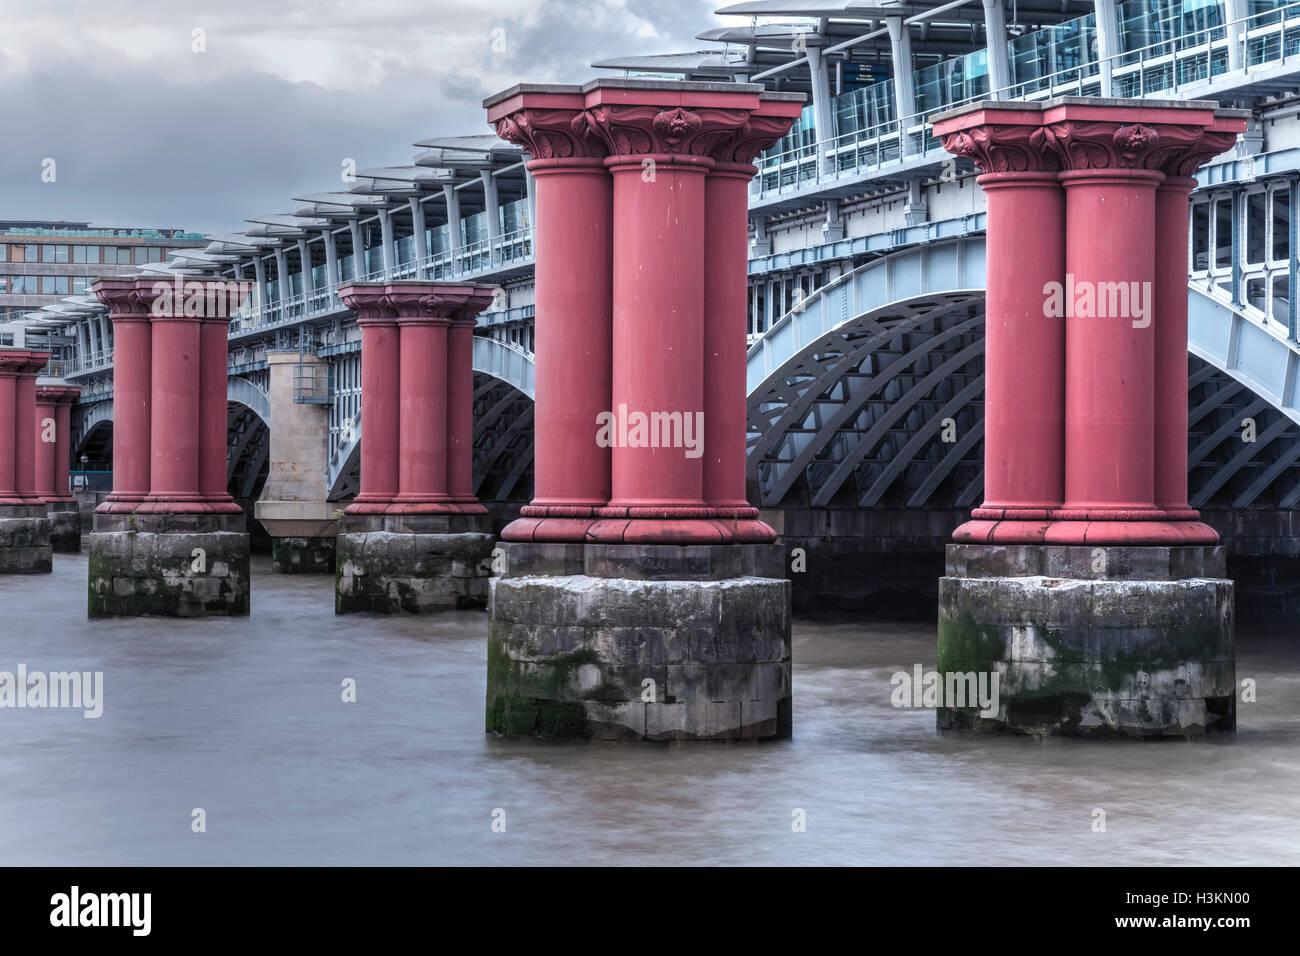 Blackfriars Bridge, London, England, UK - Stock Image